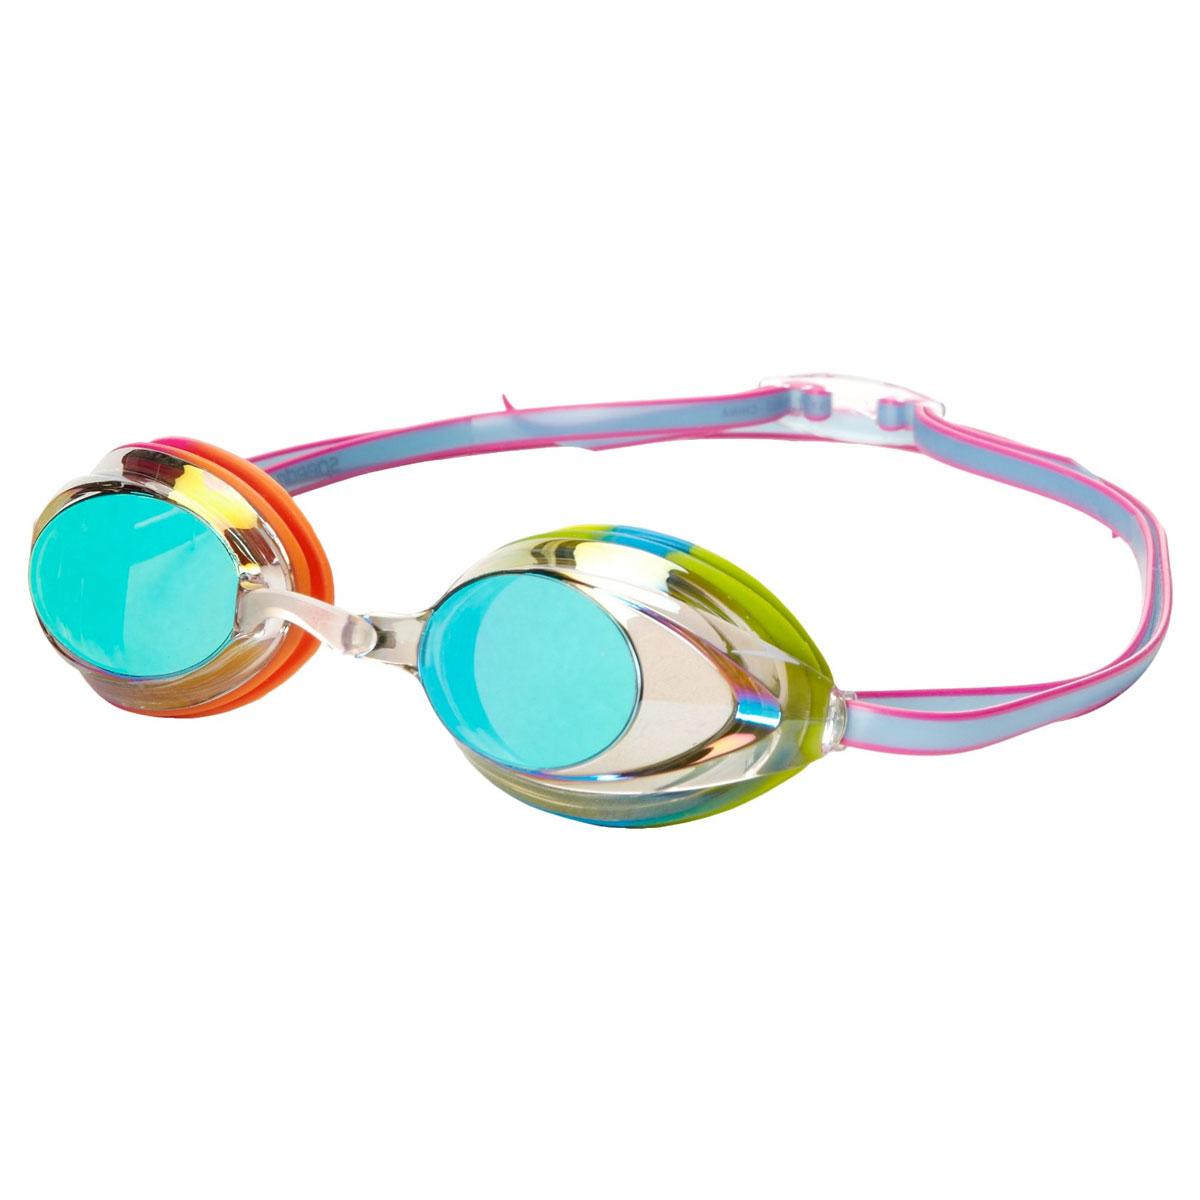 Jr. Vanquisher 2.0 Mirrored Swim Goggles, Multi, swatch